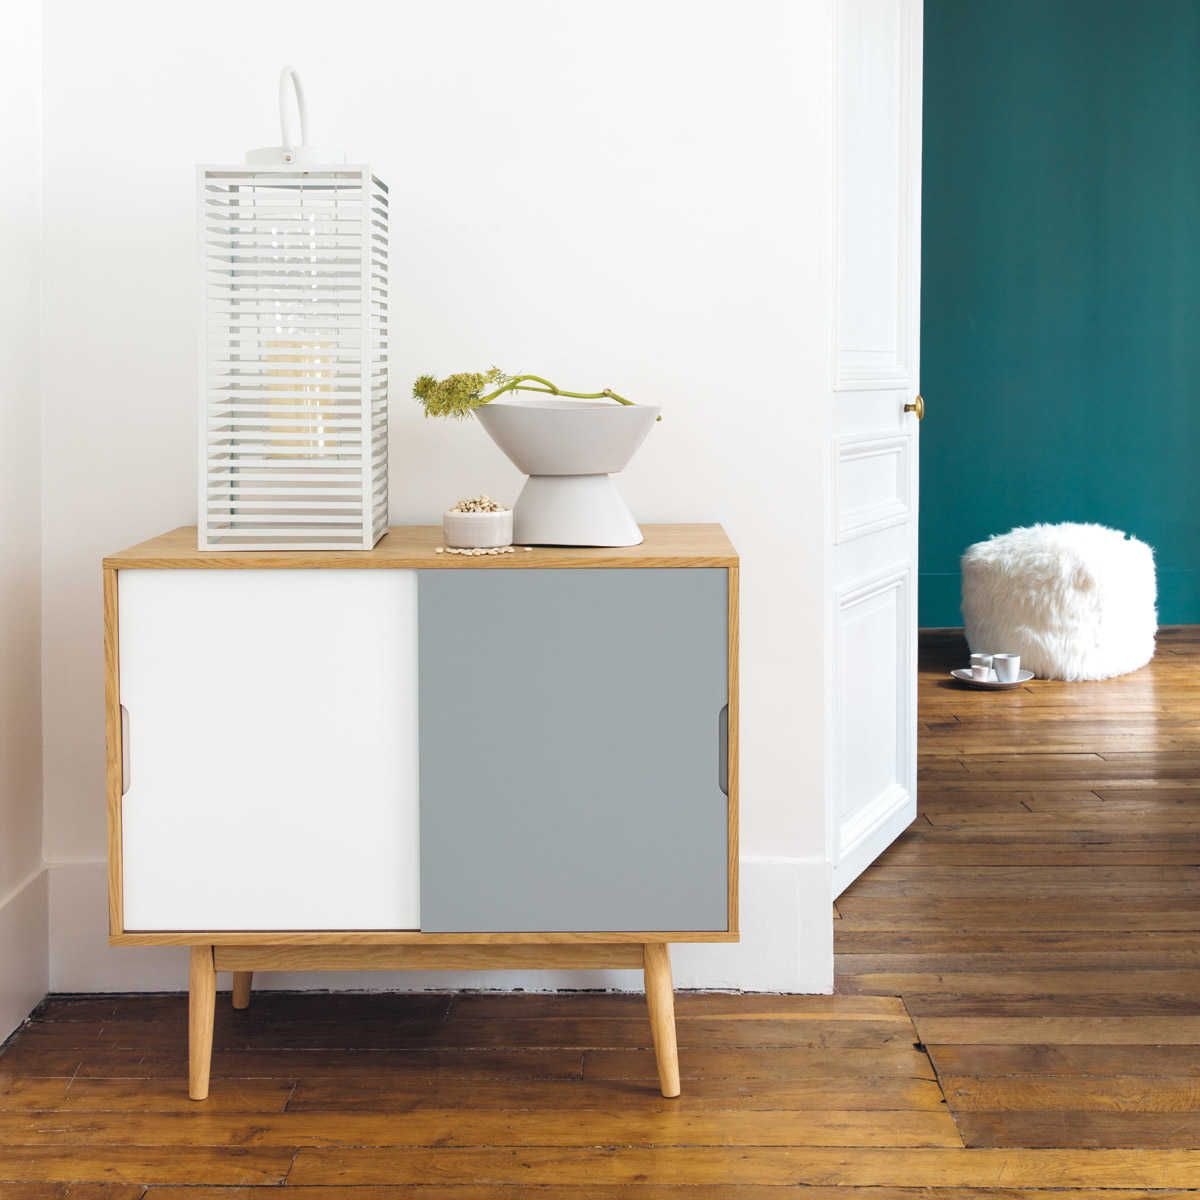 Aparador vintage blanco/gris Fjord | re-decorate | Pinterest ...